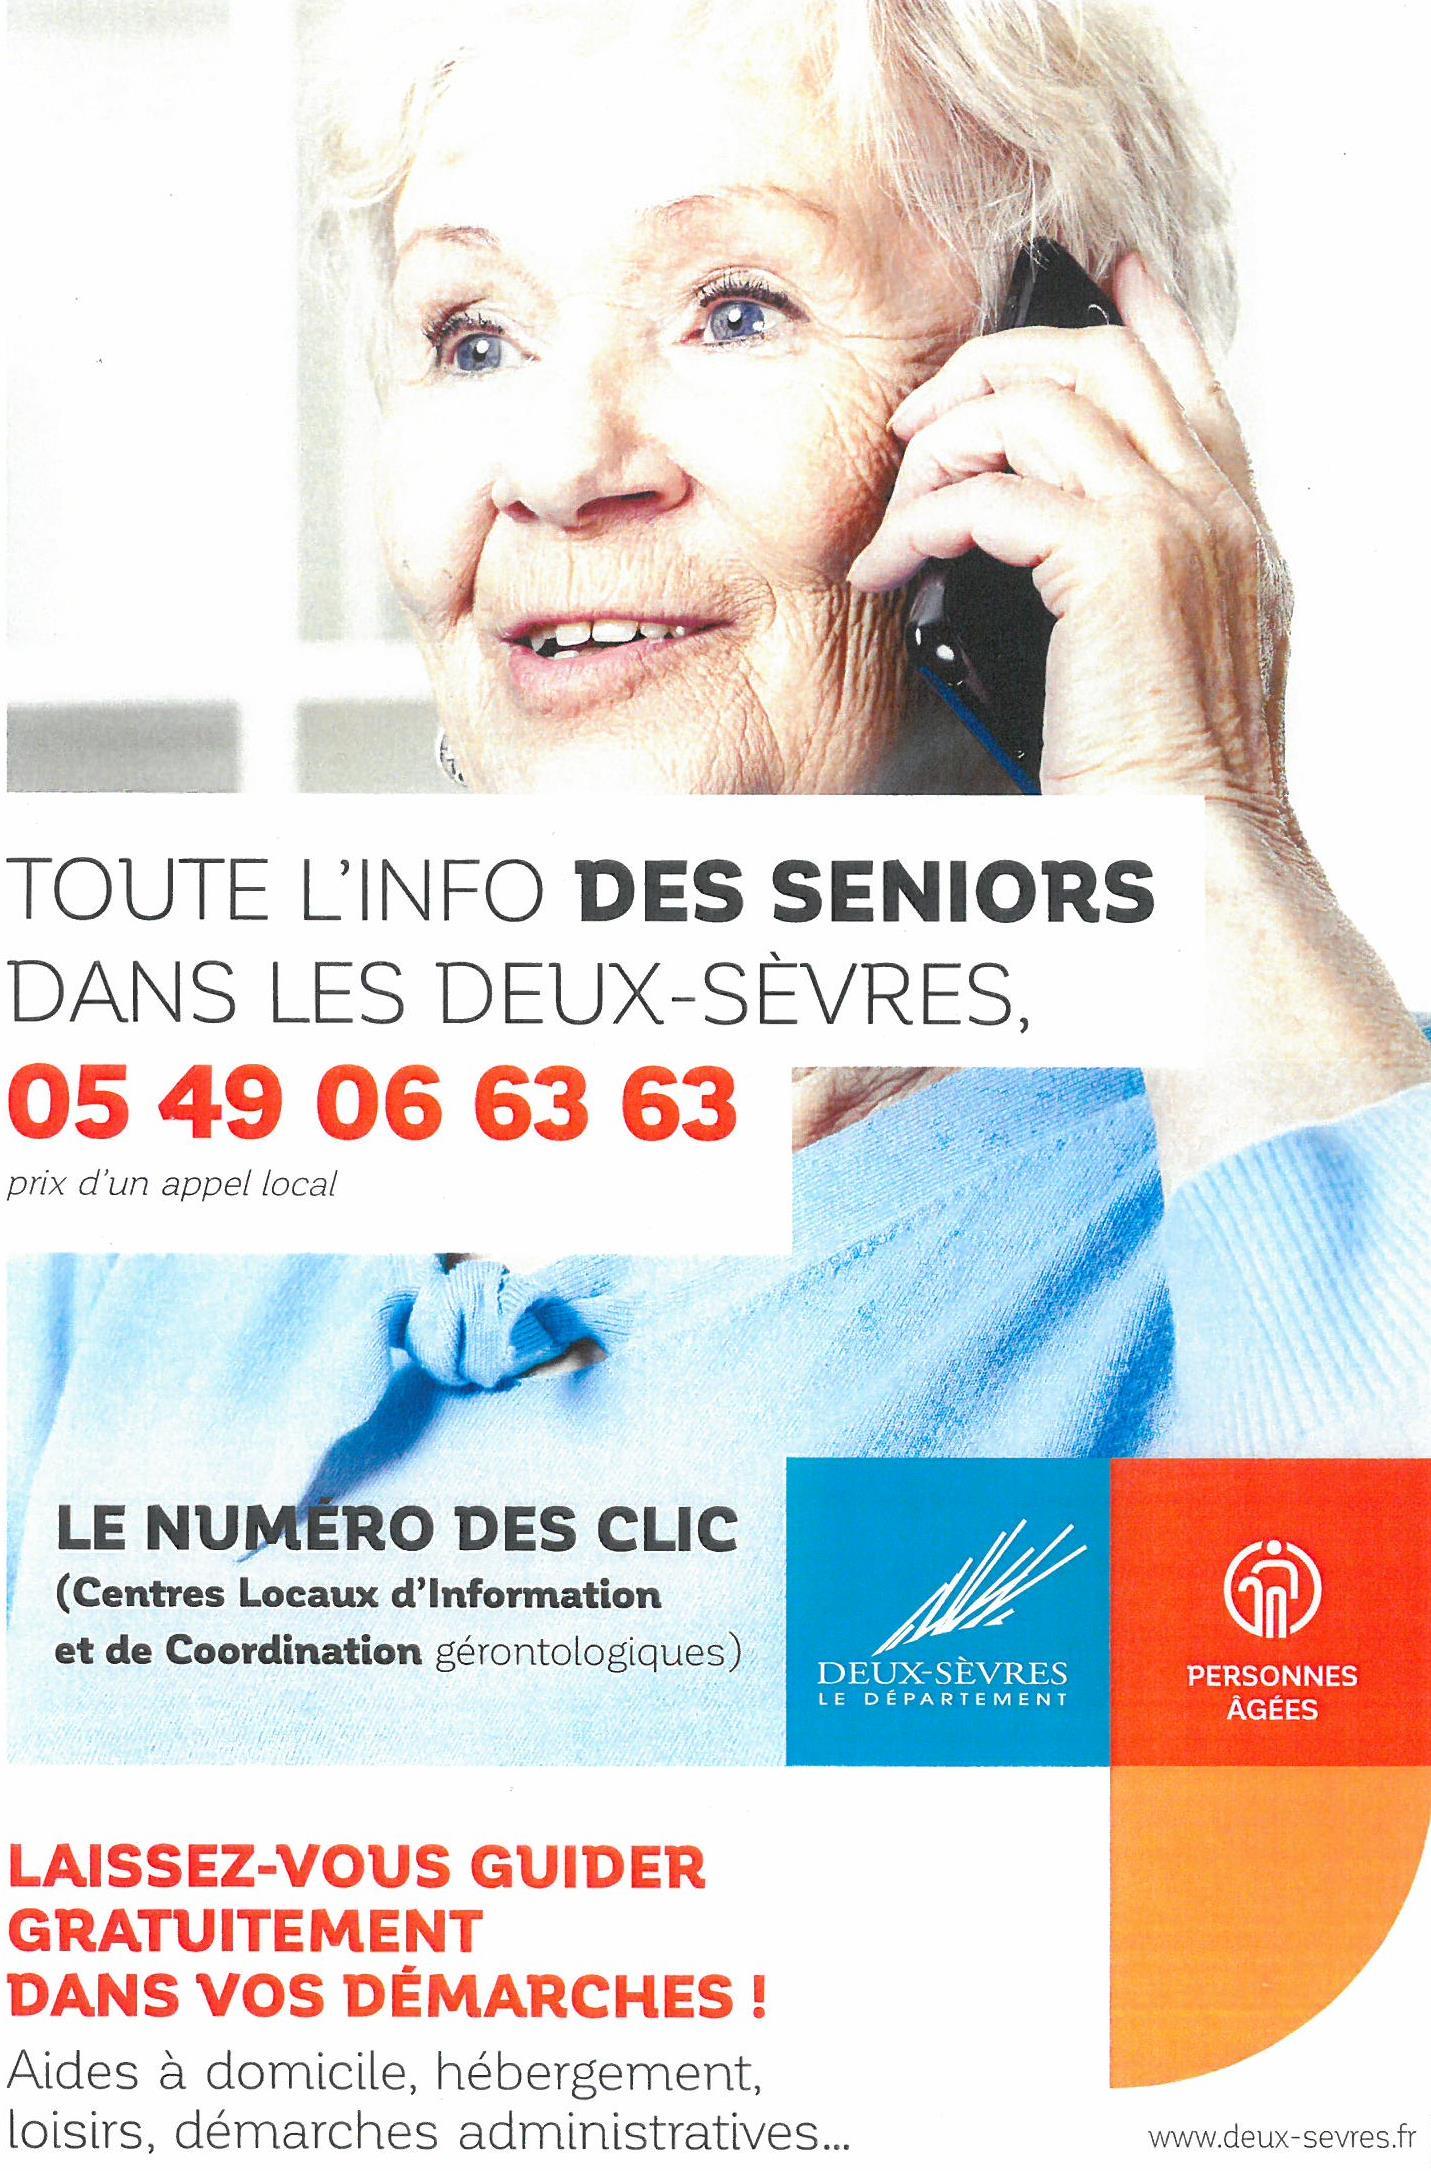 TELEPHONE - CLIC